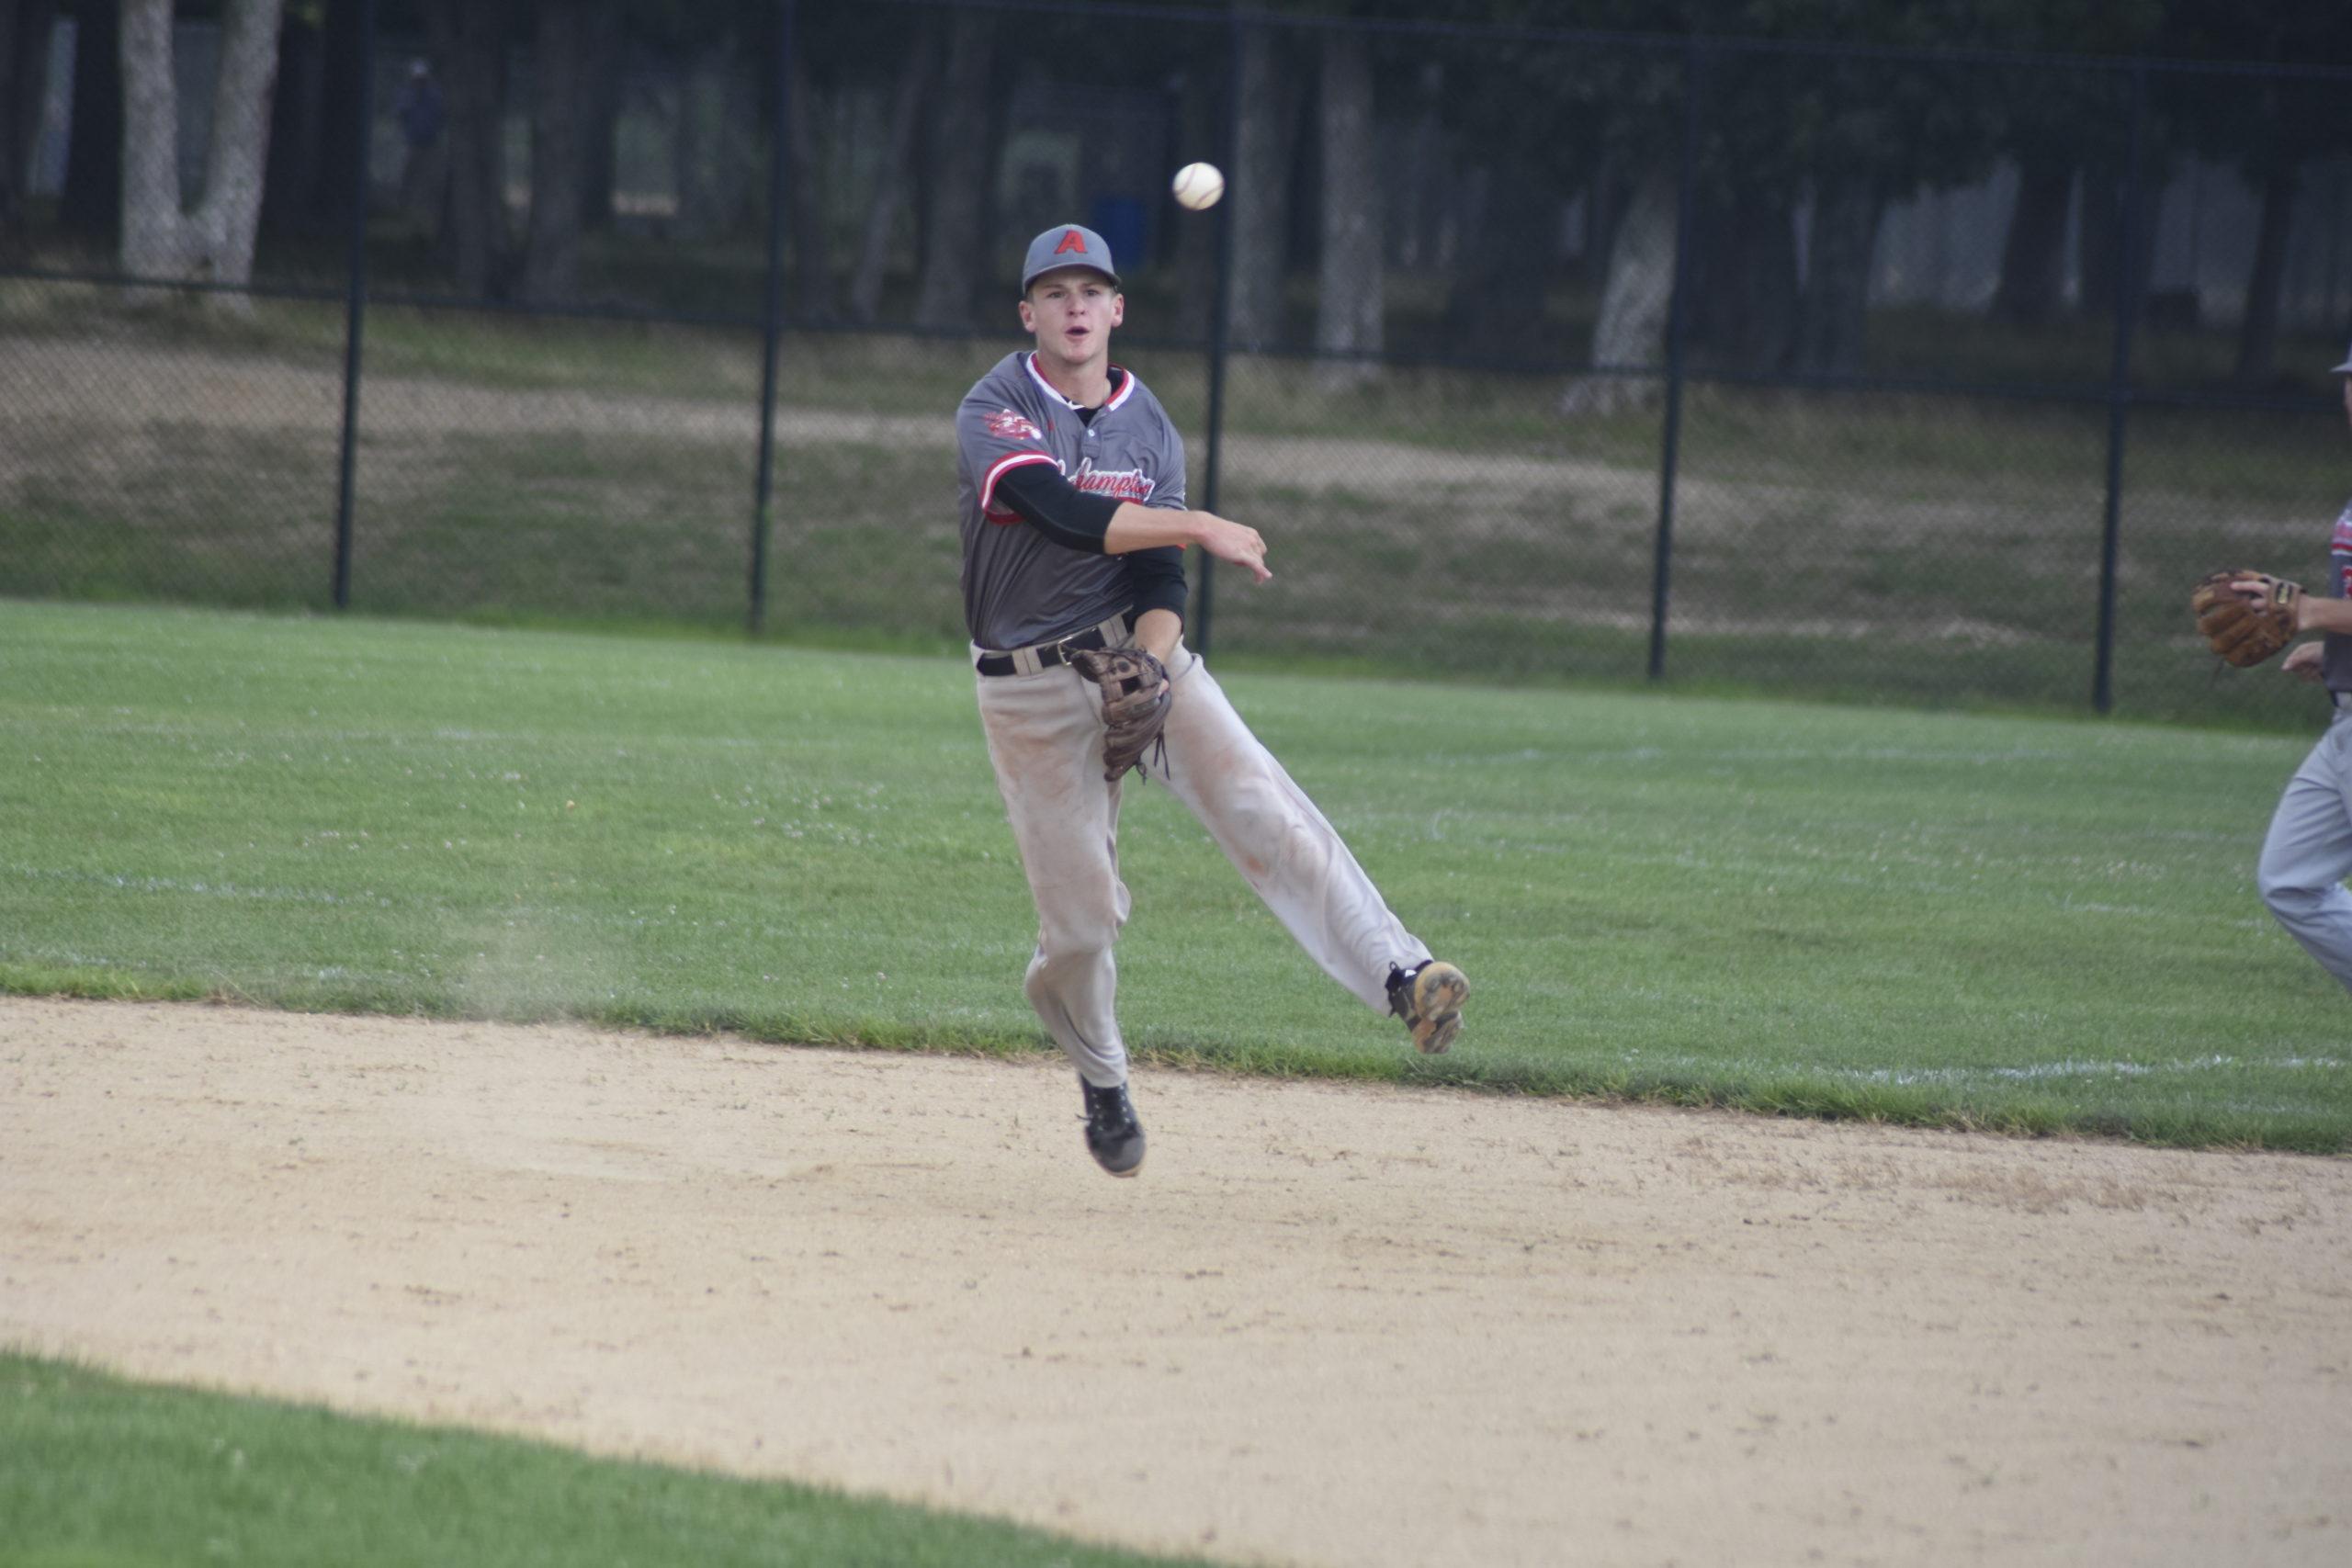 Westhampton shortstop Brady Short (Stony Brook University) makes a play behind second base.